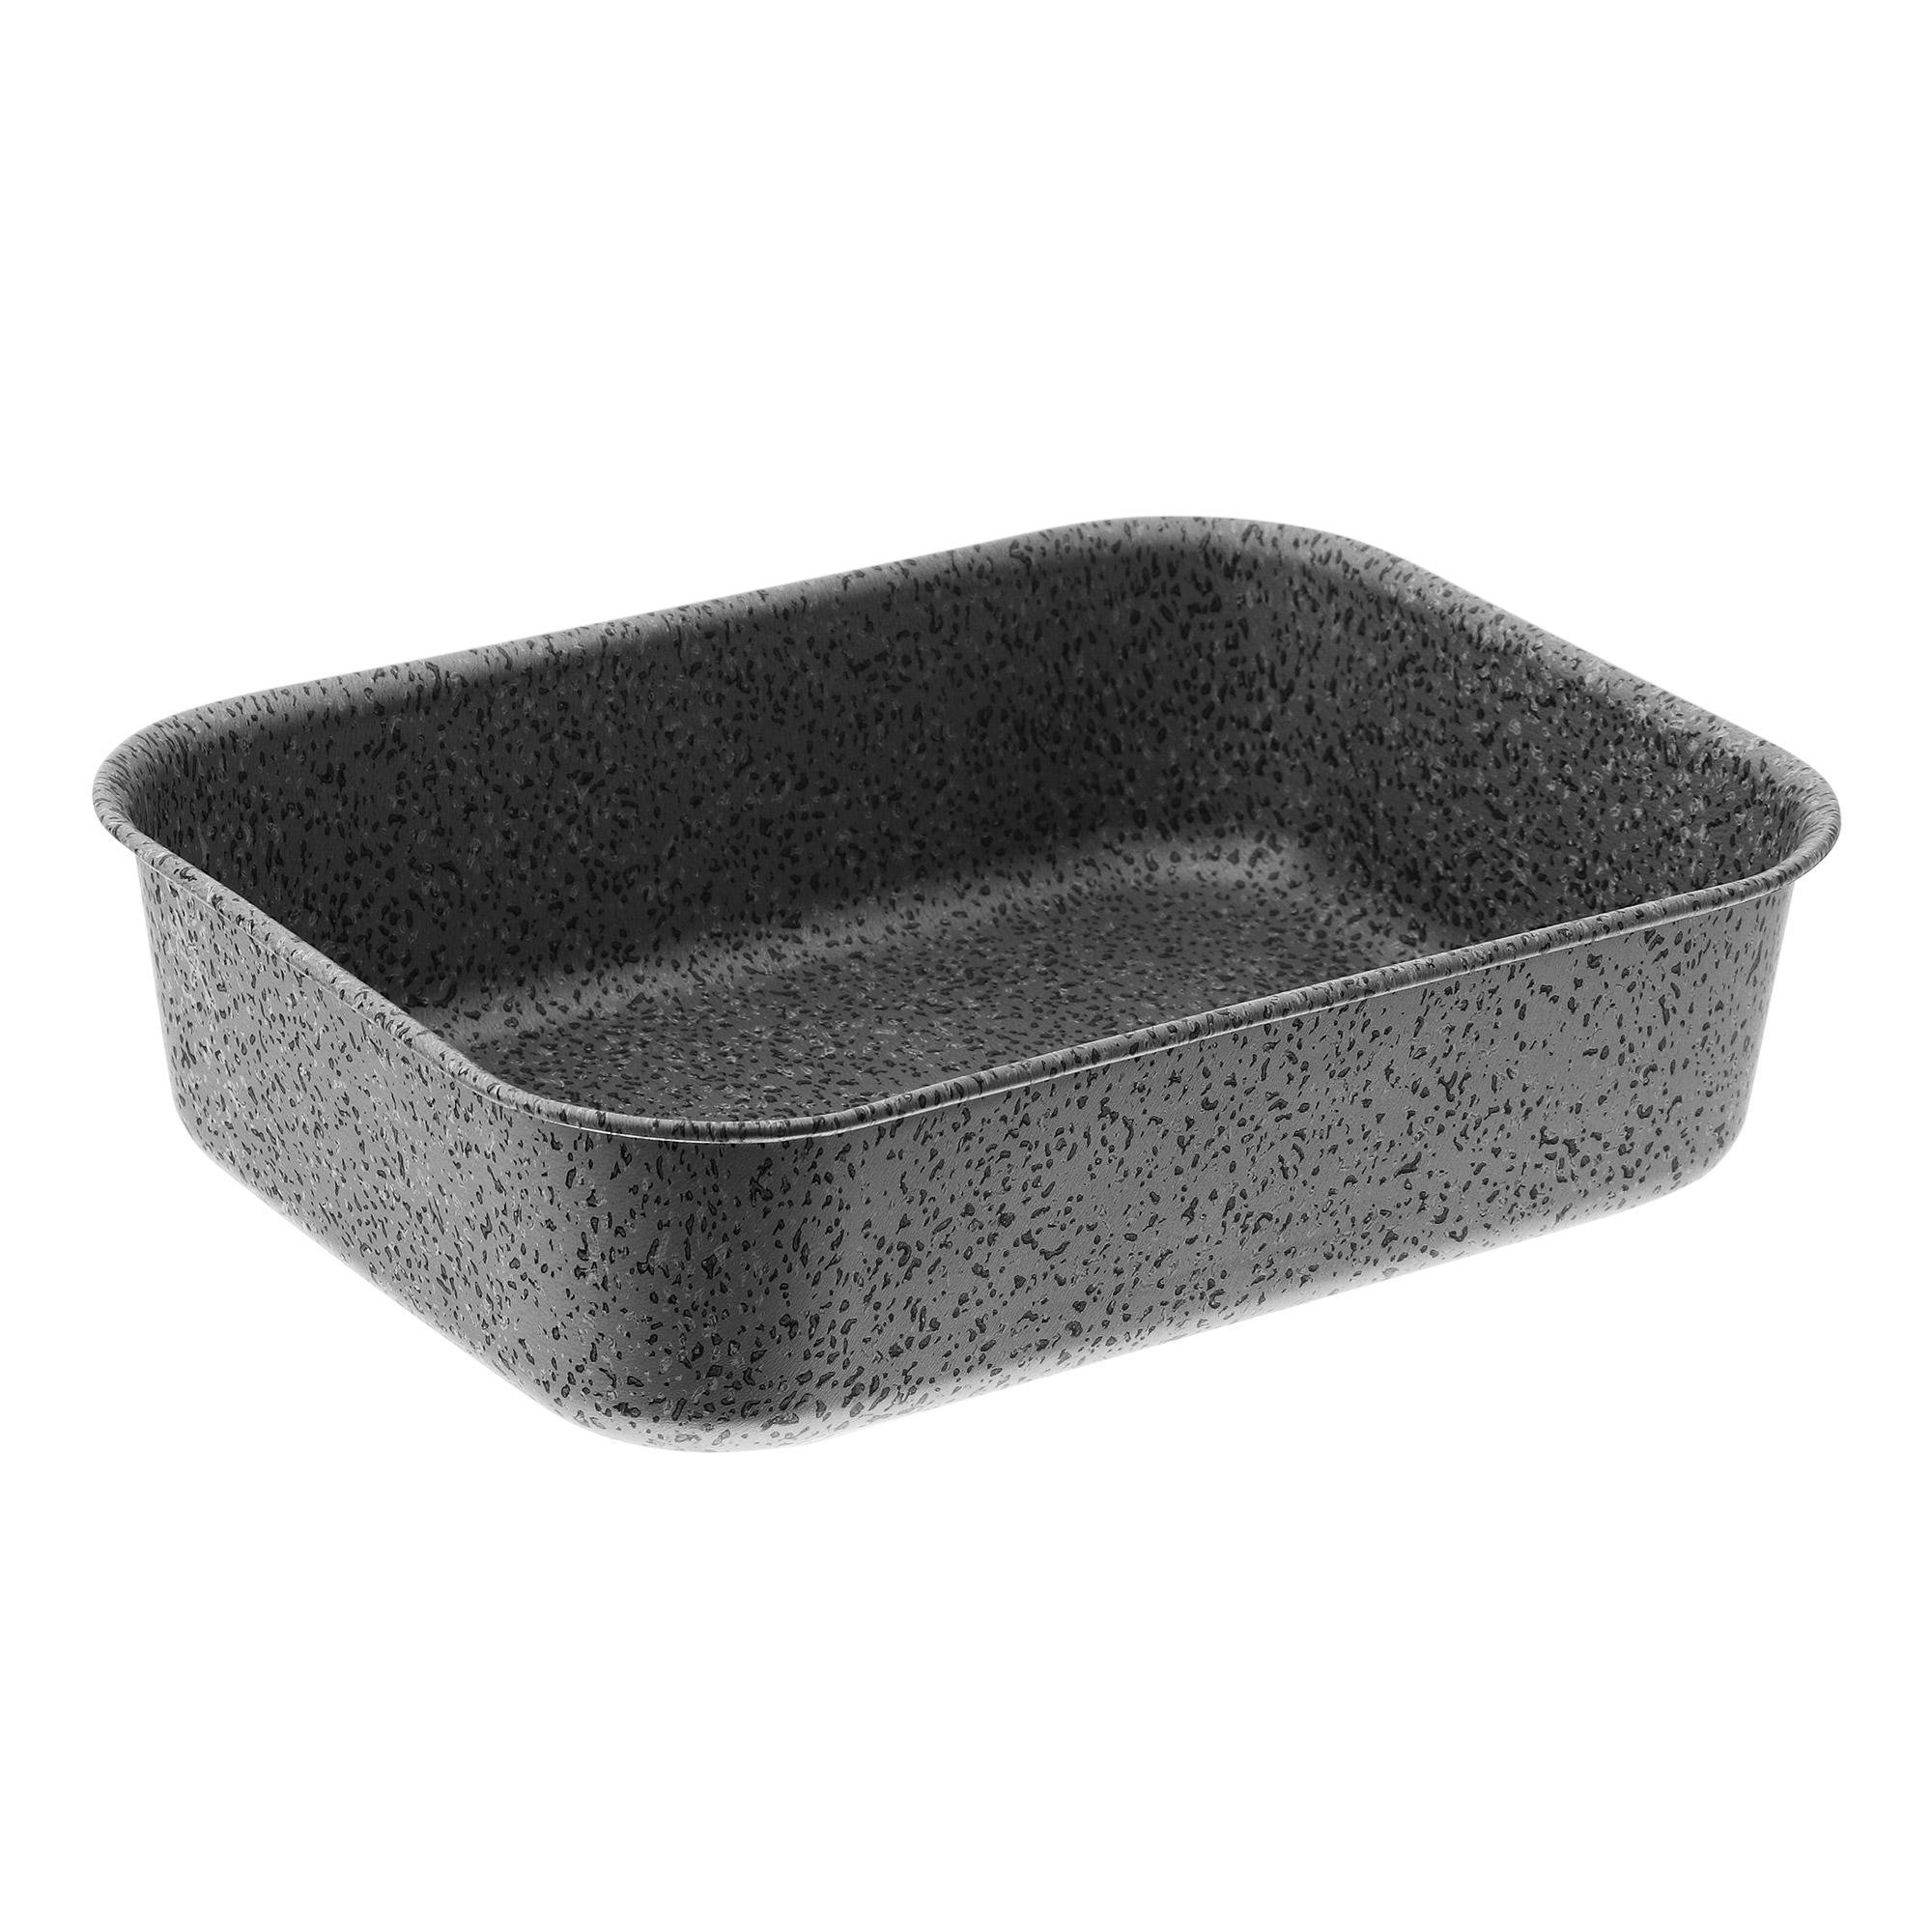 Форма для выпекания Mamu Fiamma 27х19 см форма для выпекания металл frittori esf 26 26х7см